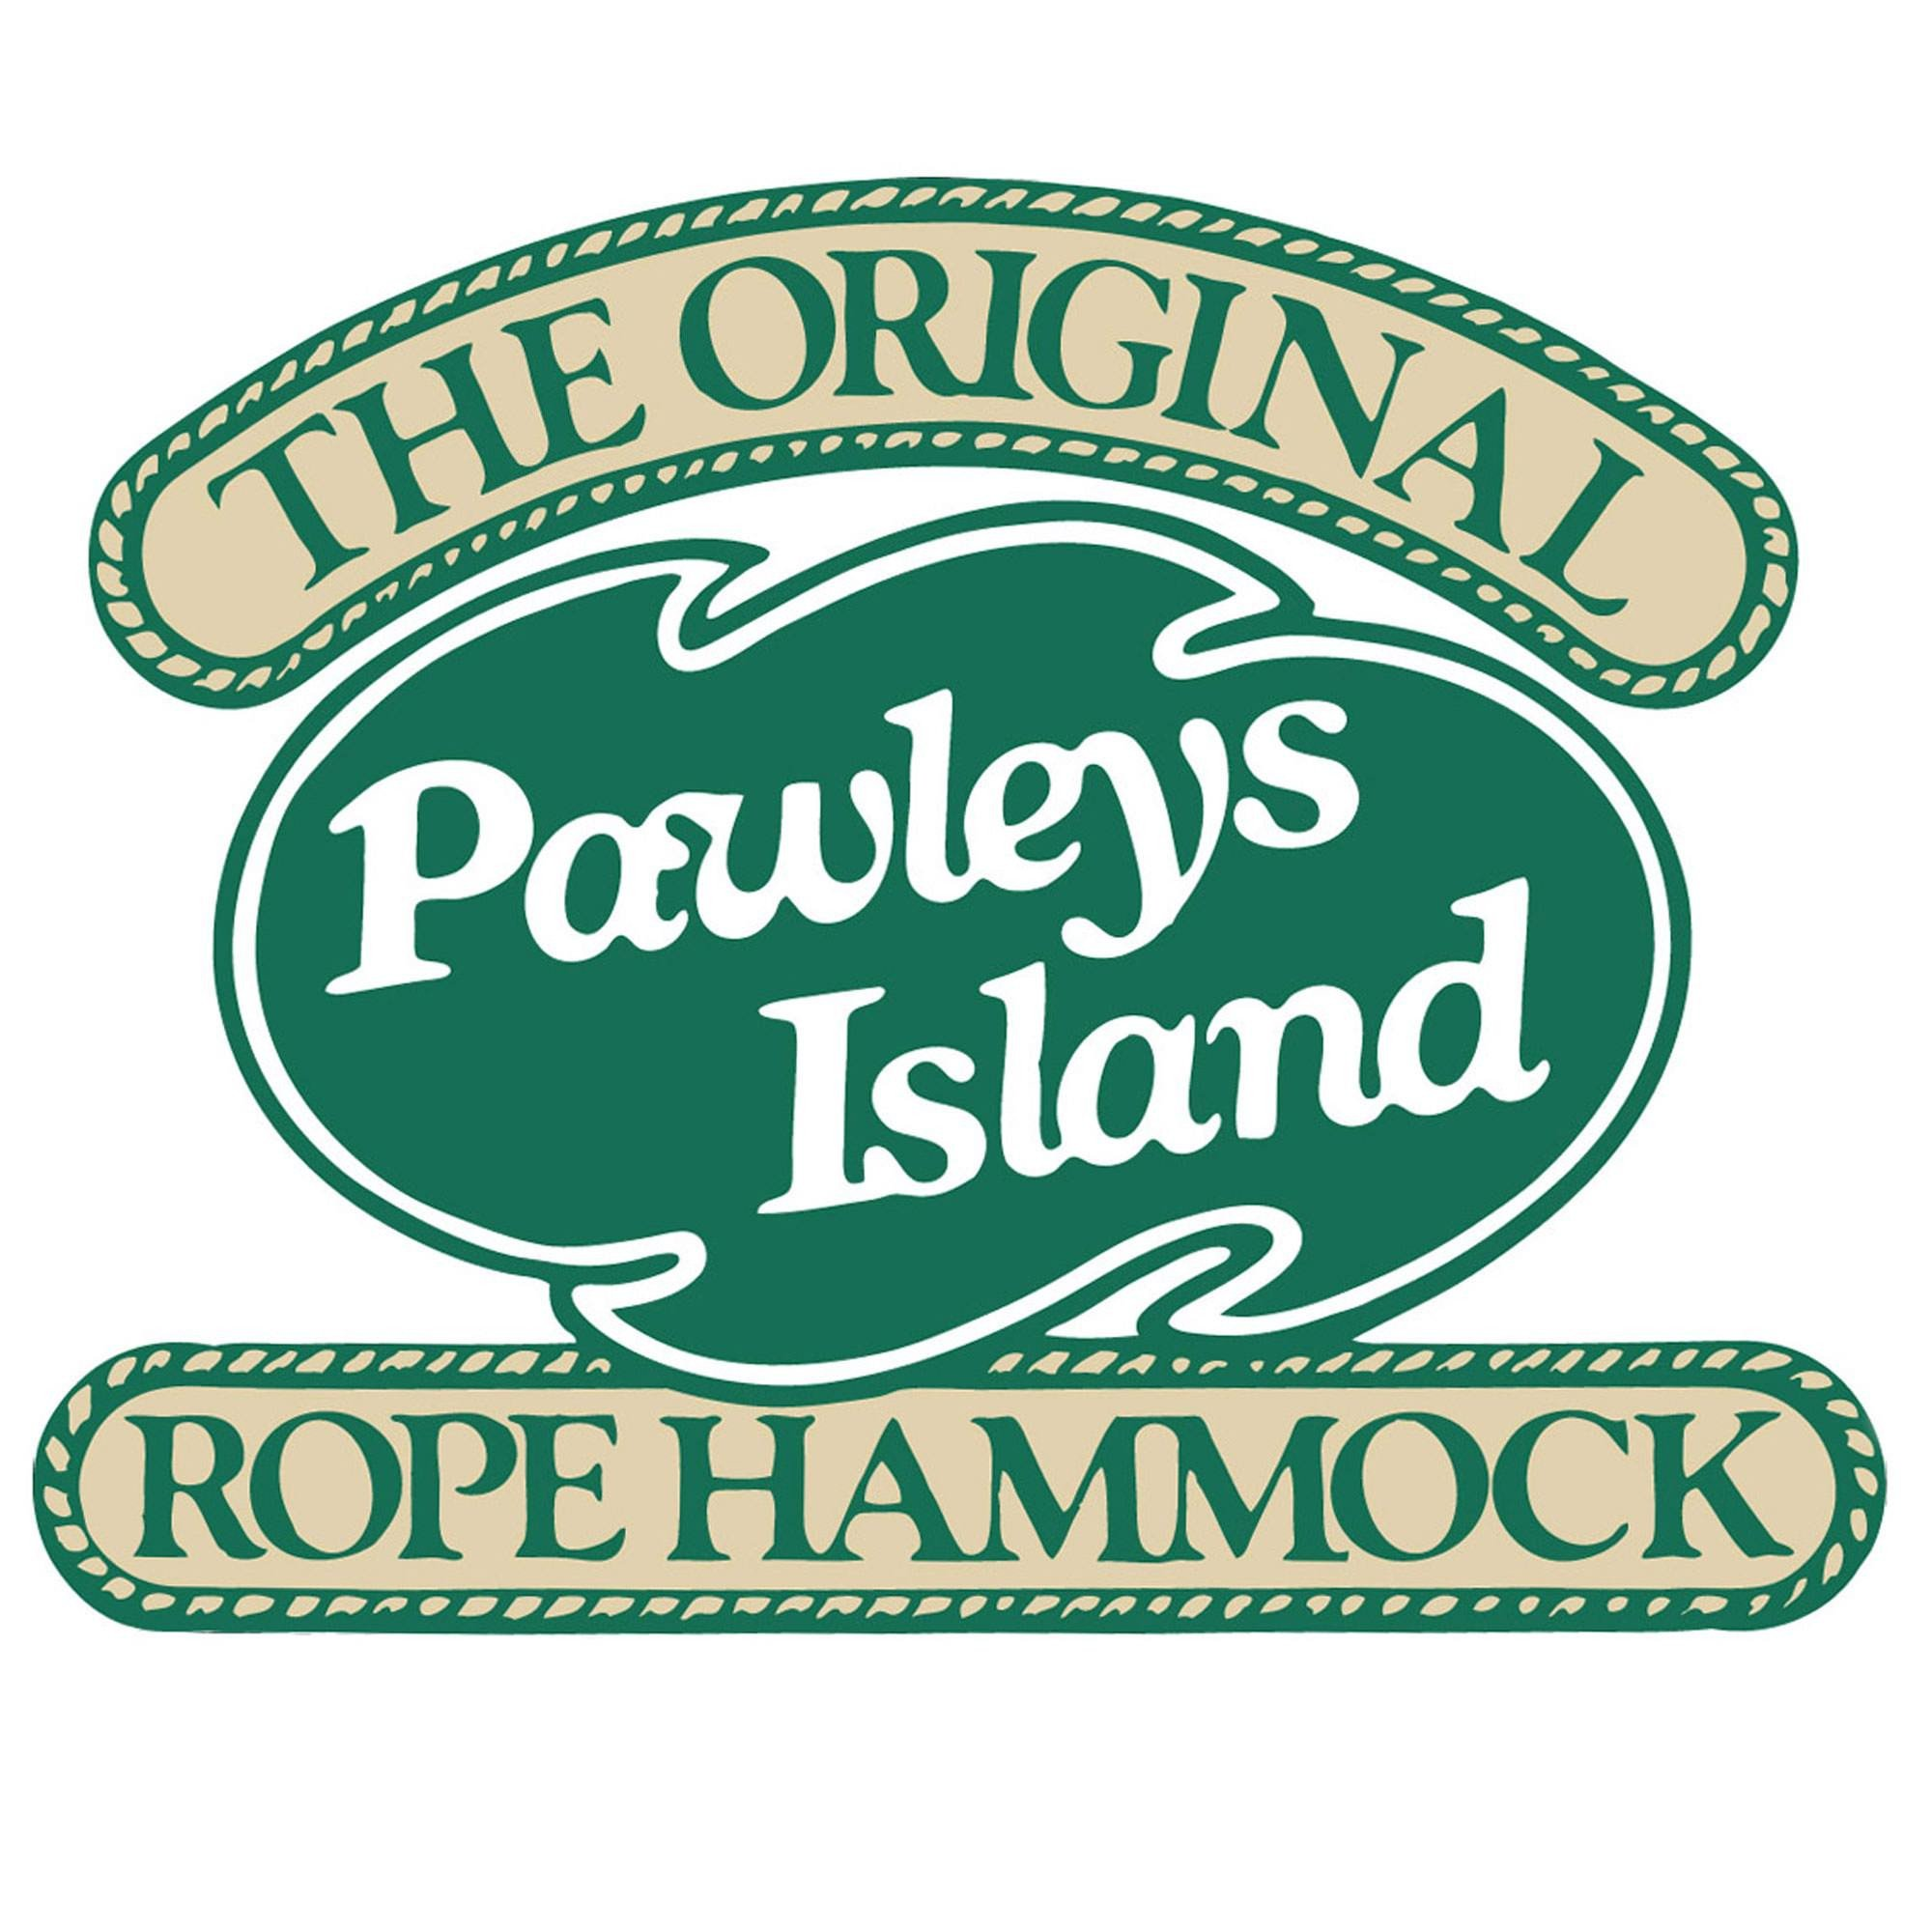 pawleys